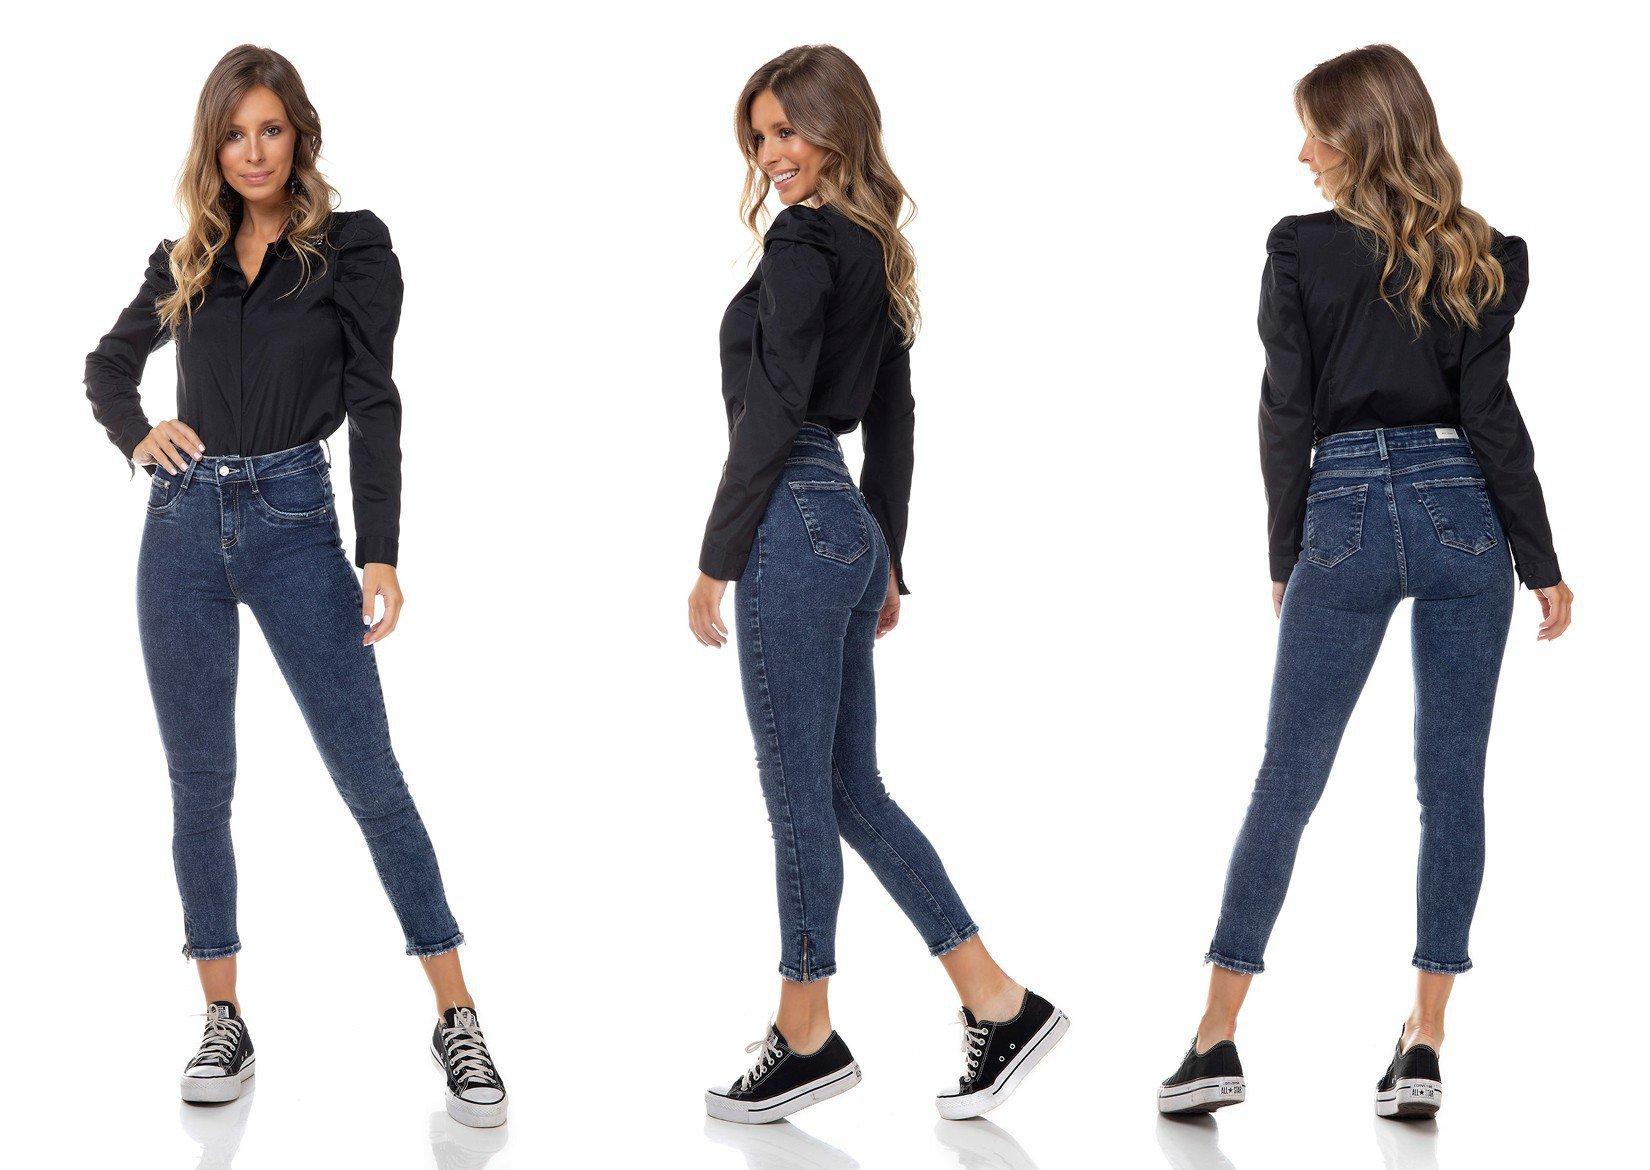 dz3352 calca jeans feminina skinny media cropped com ziper decorativo na barra denim zero tripla